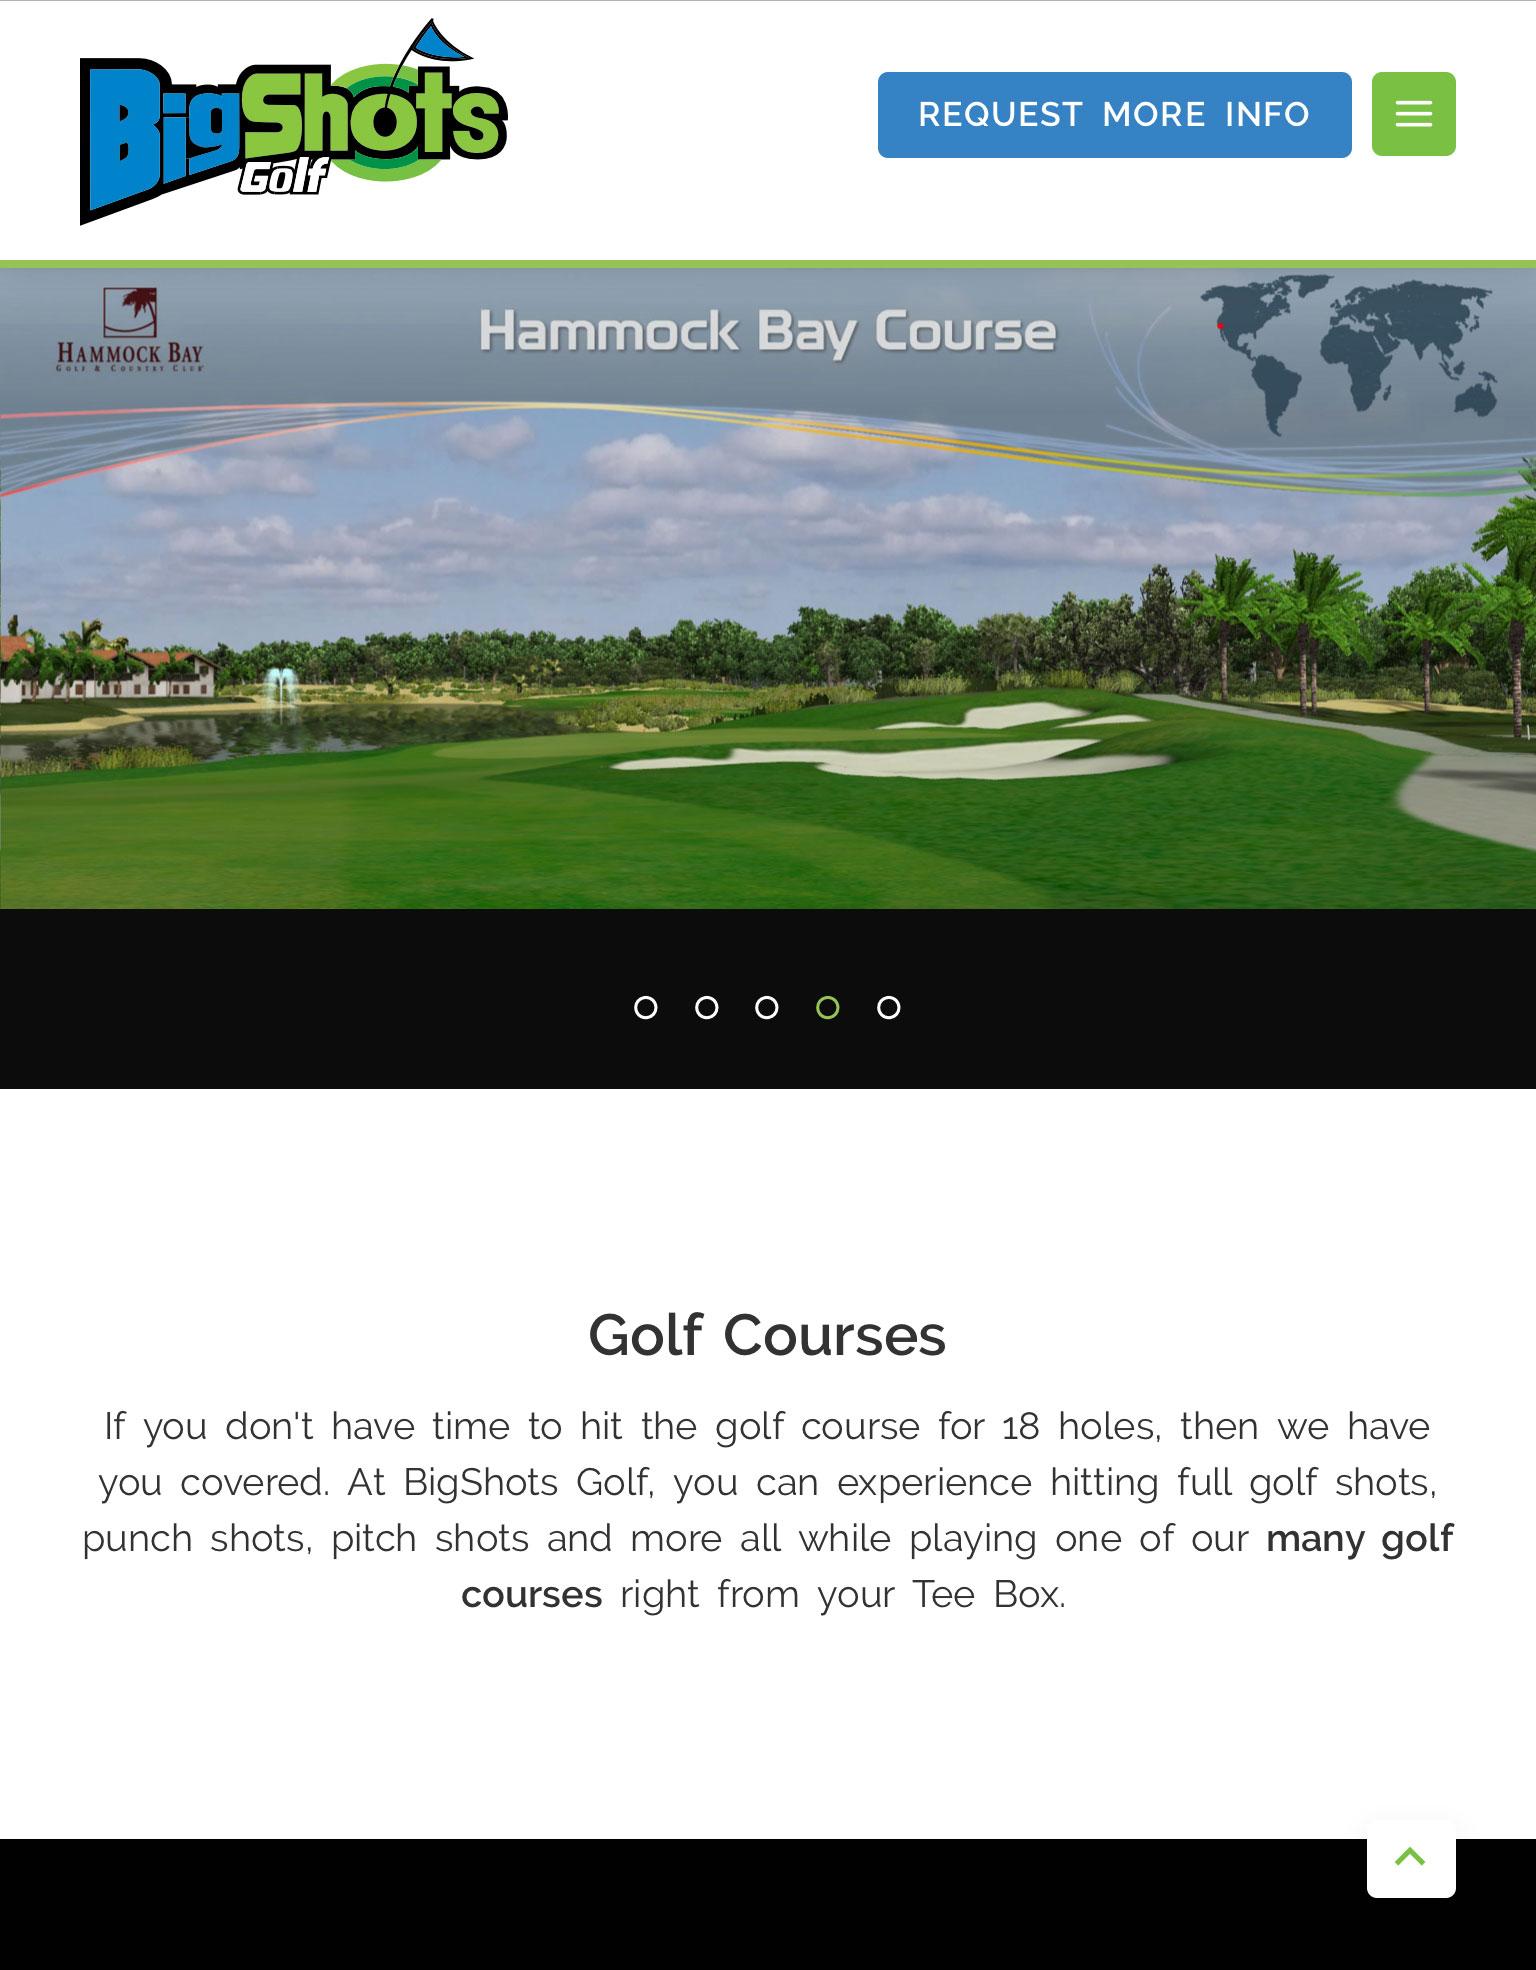 bigshots-golf-peoria-tablet-web-design-3